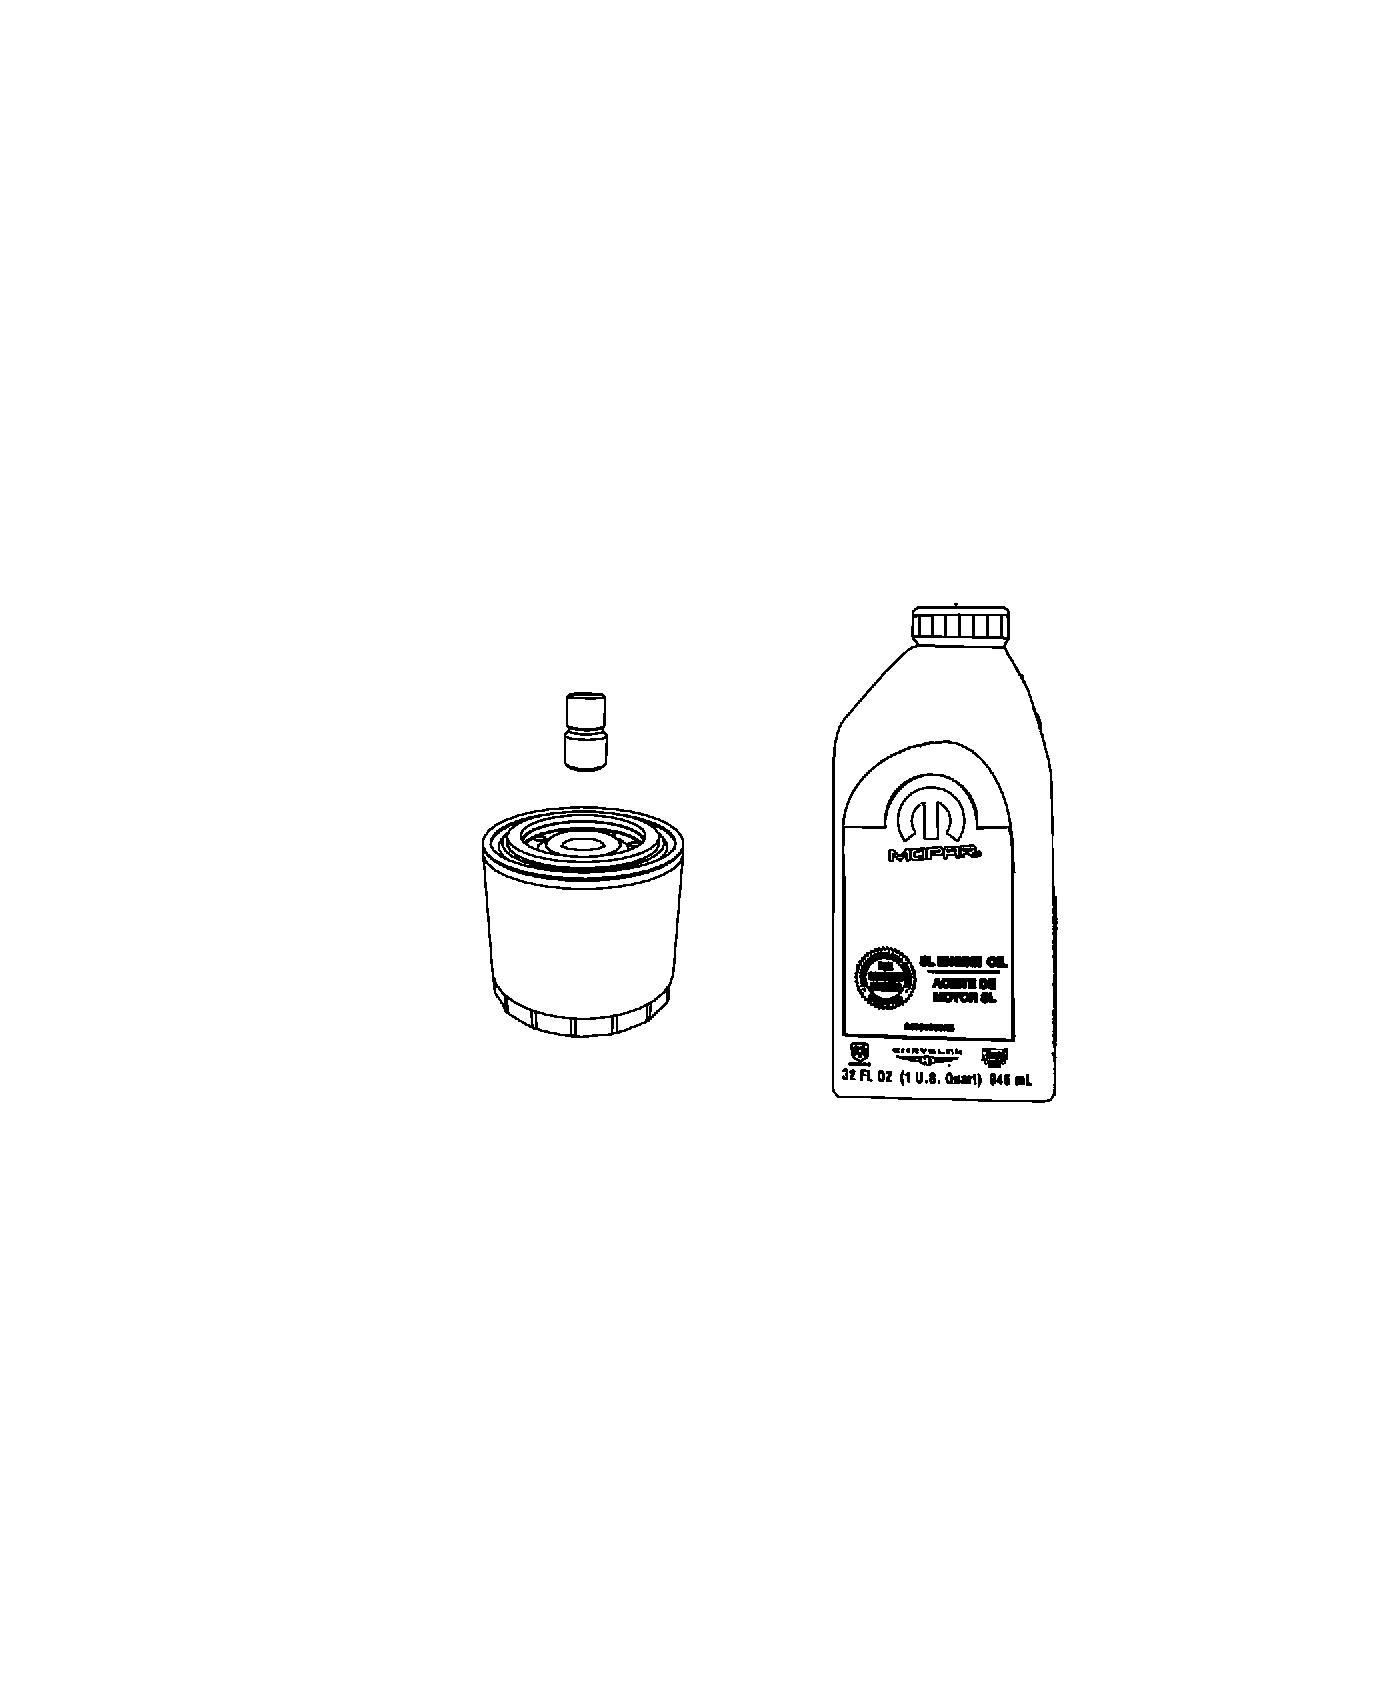 Ram 3500 Tray  Oil Drain  Engine  Adapter  Filter